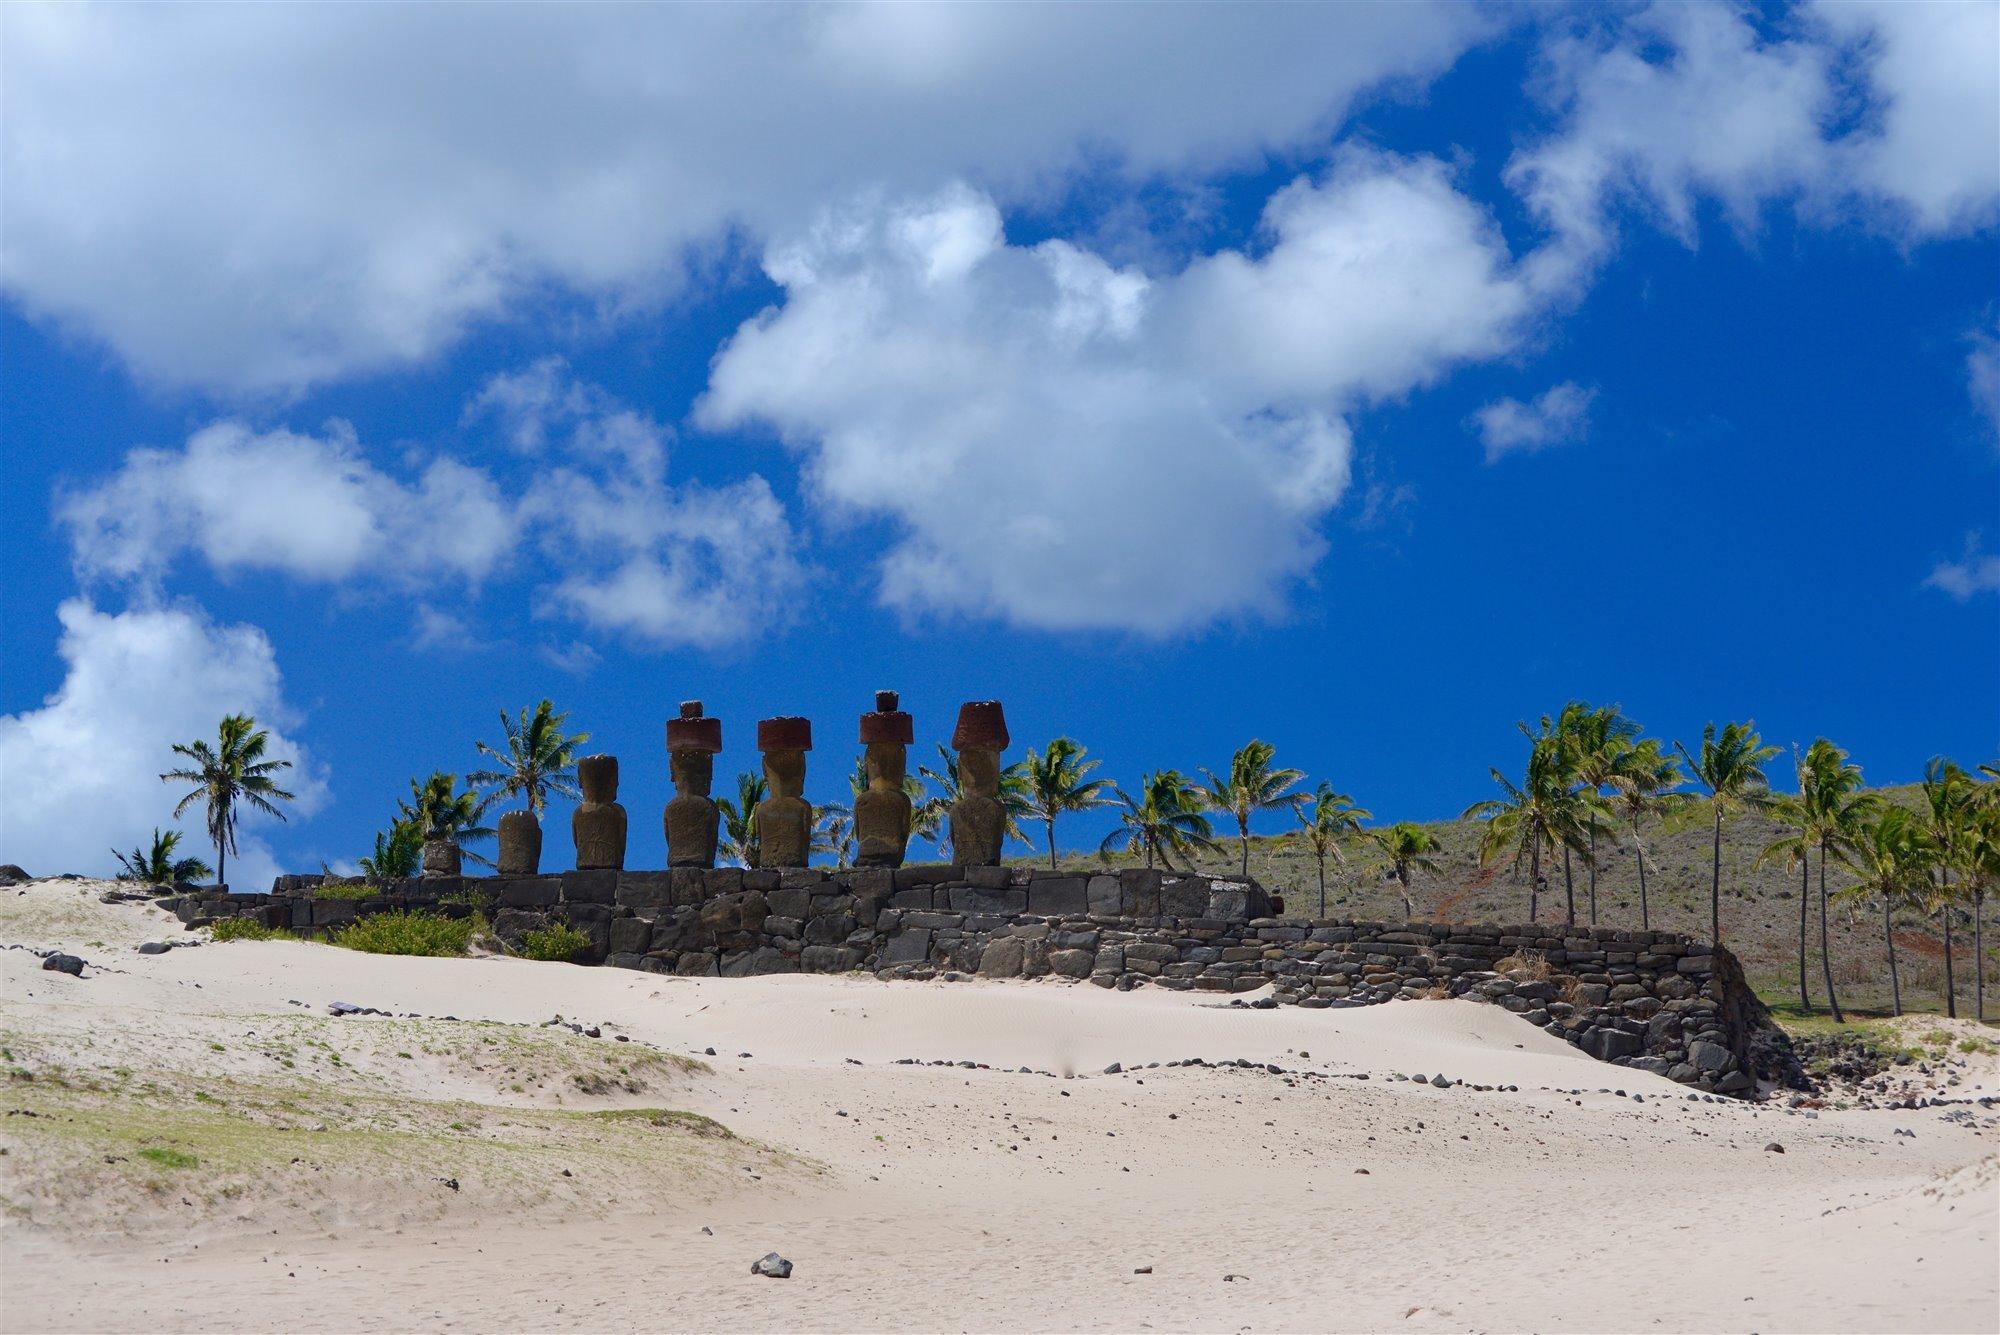 rapanui4. Los moáis de playa Anakena